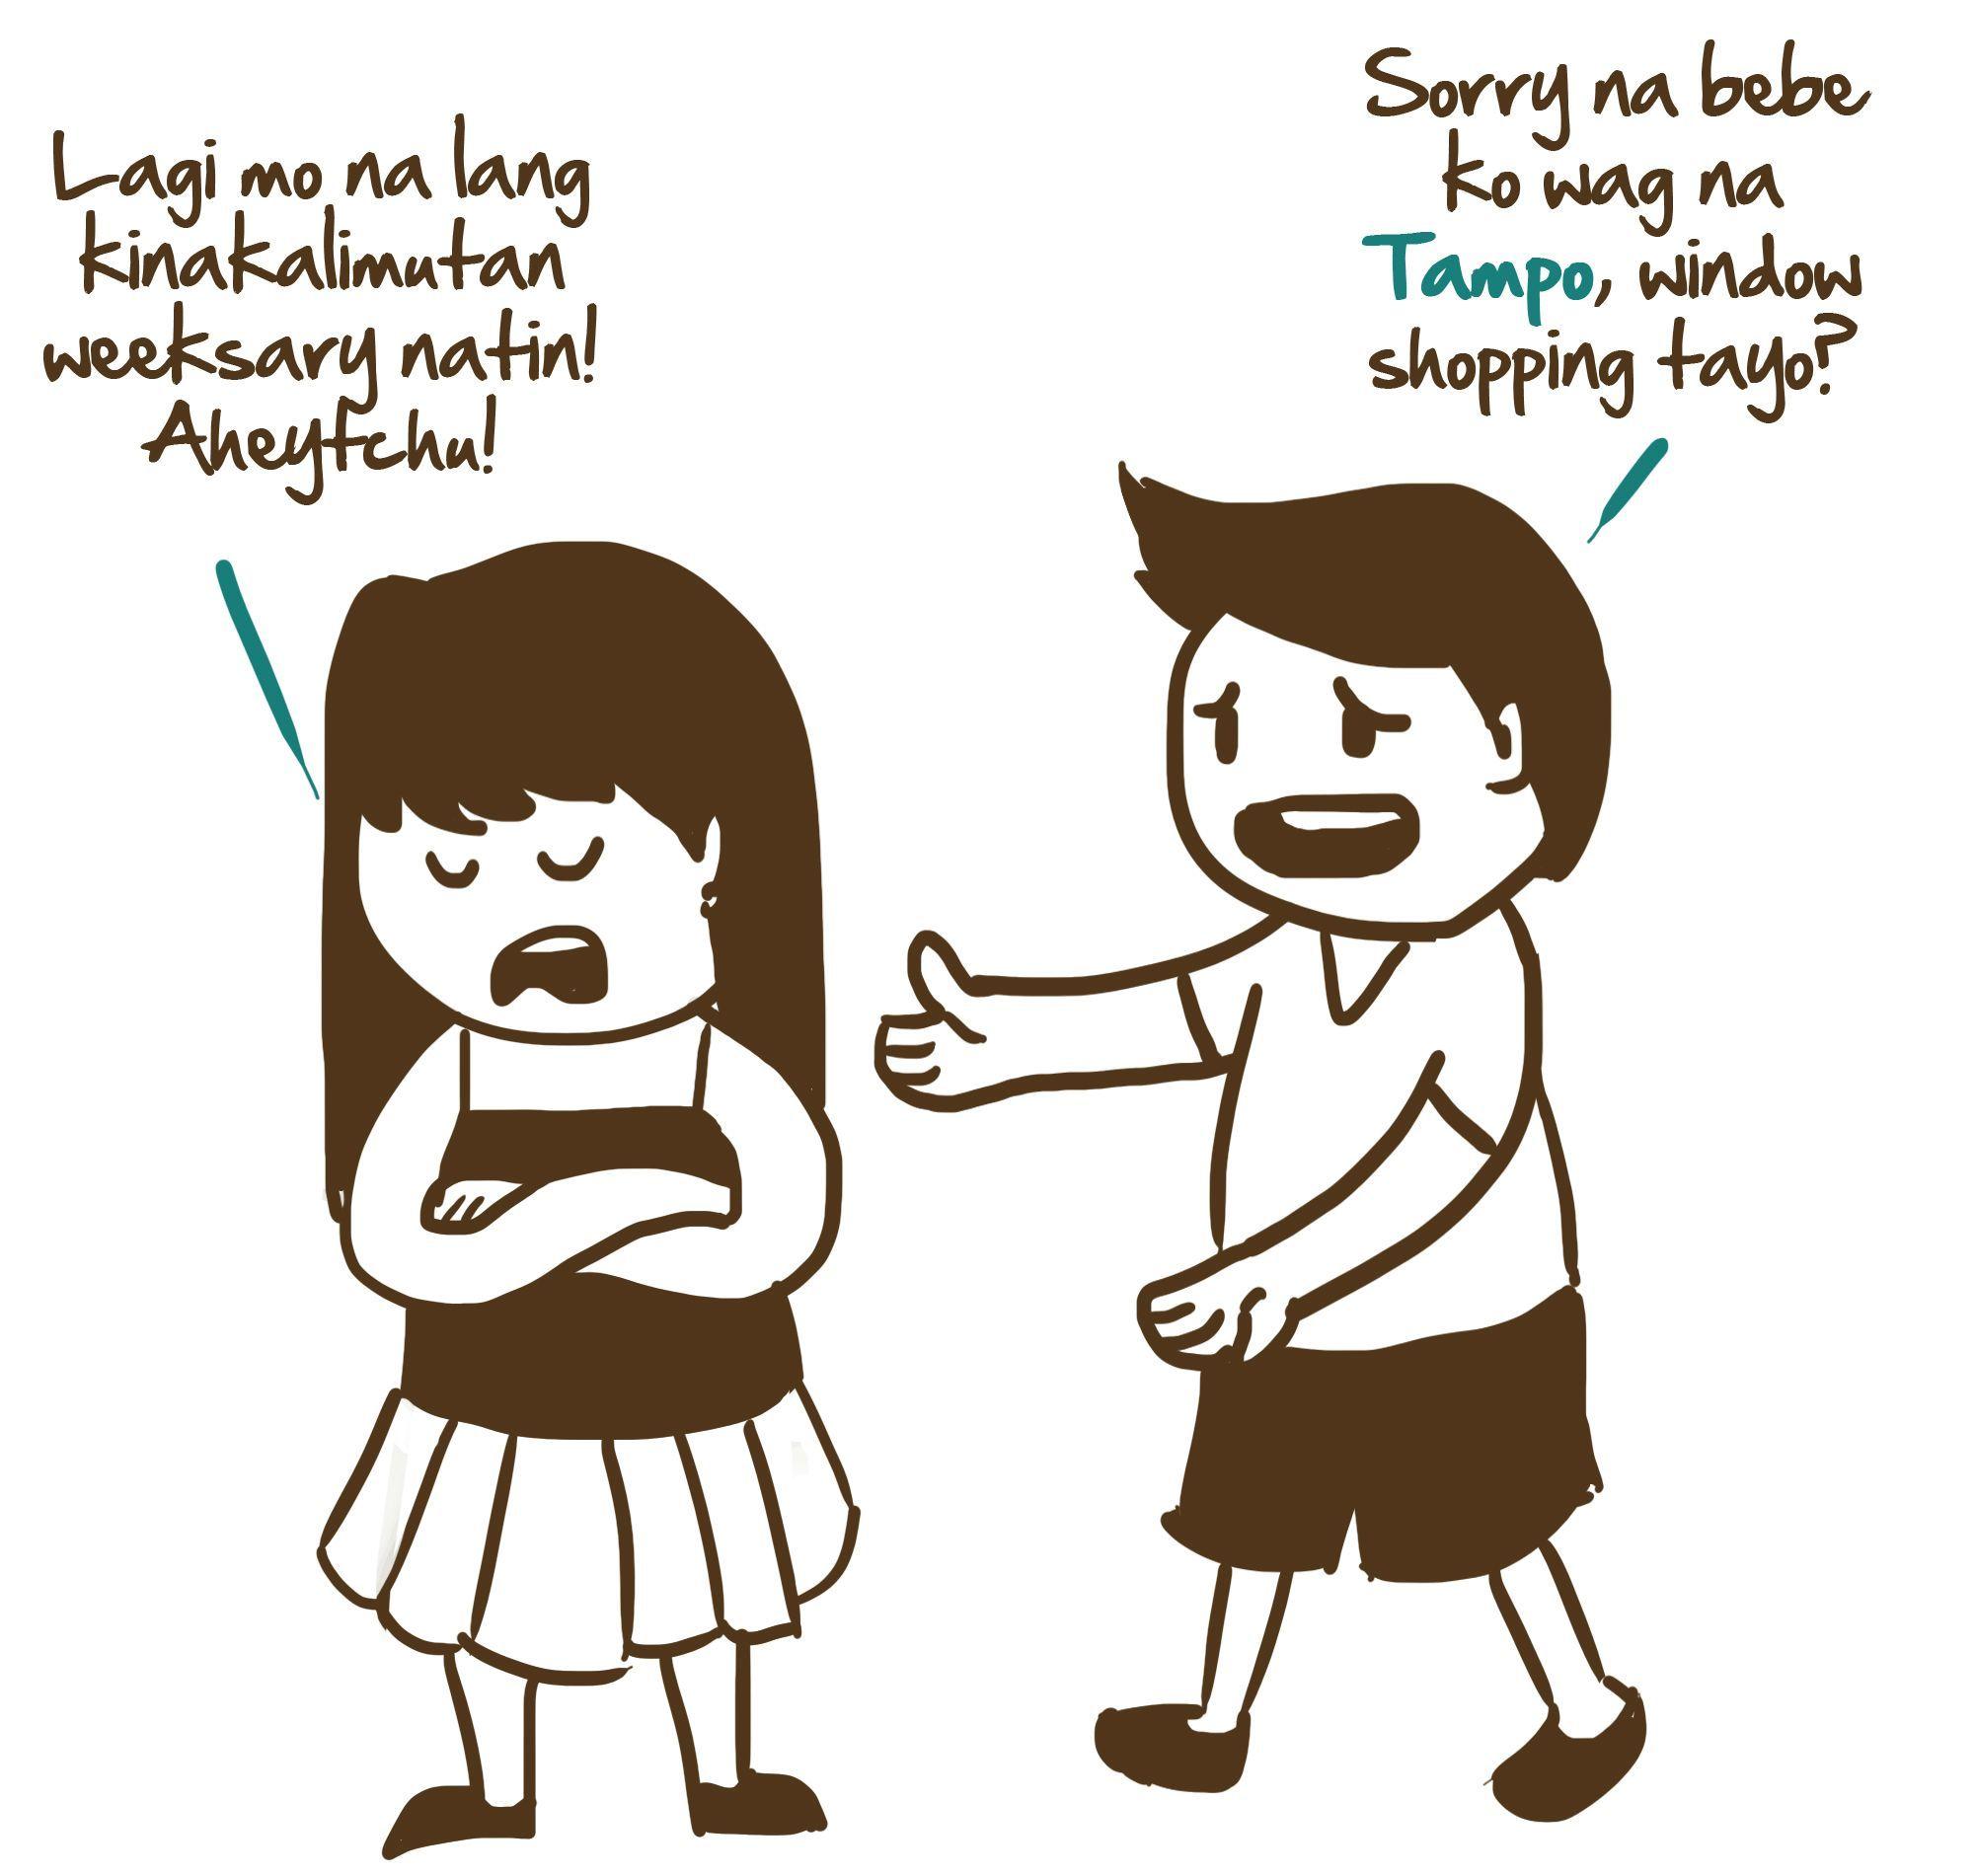 Dating tayo translate in english